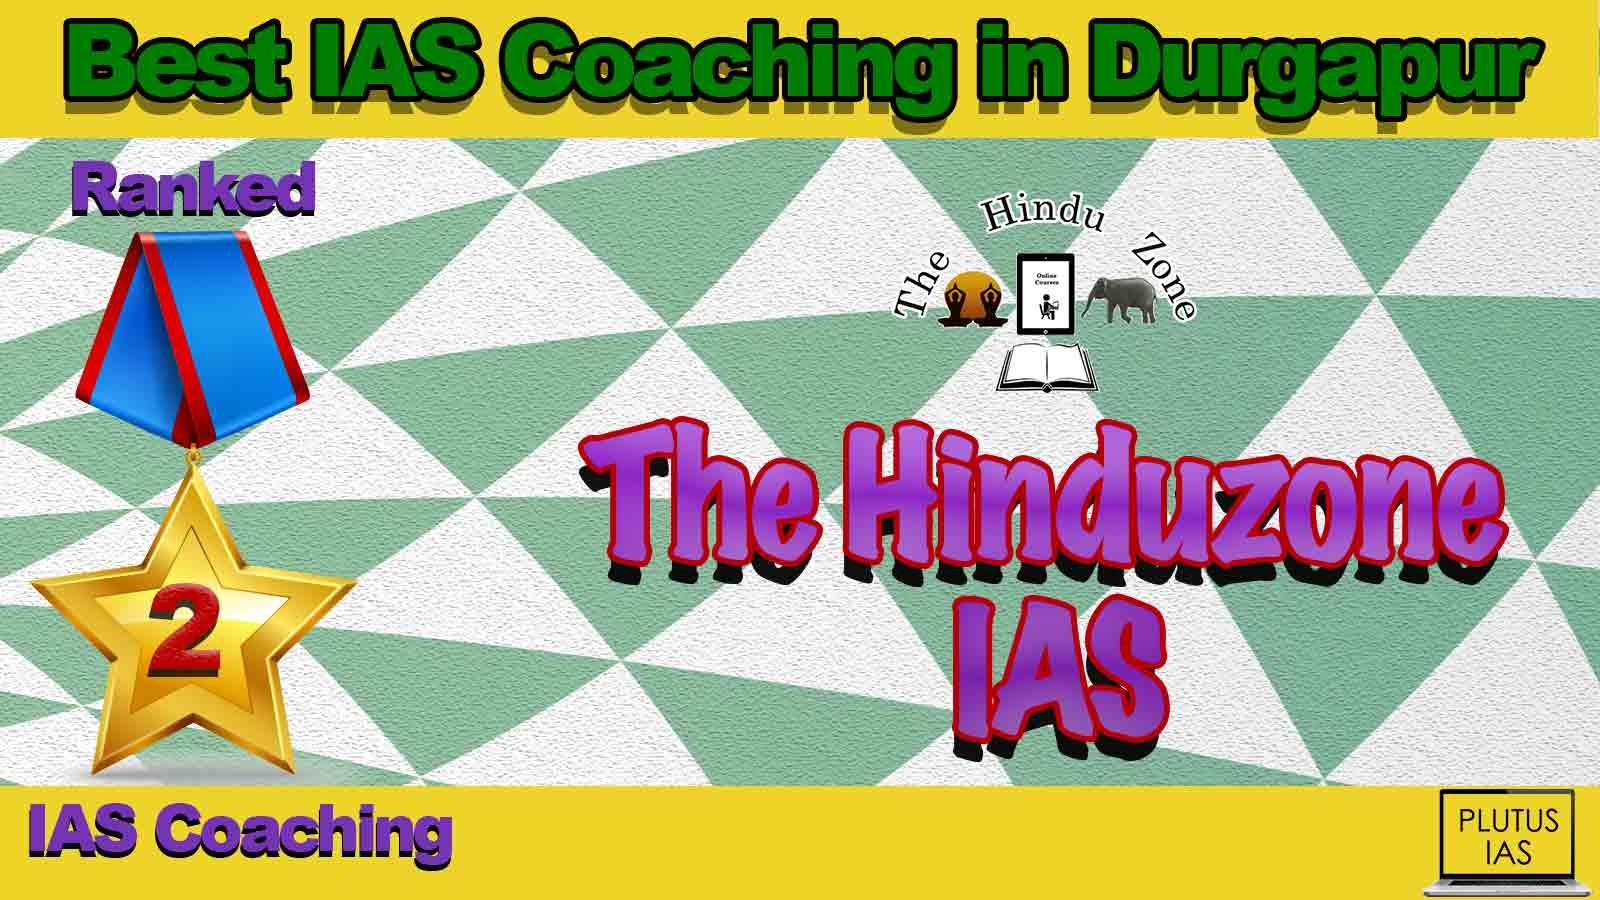 Top IAS Coaching in Durgapur